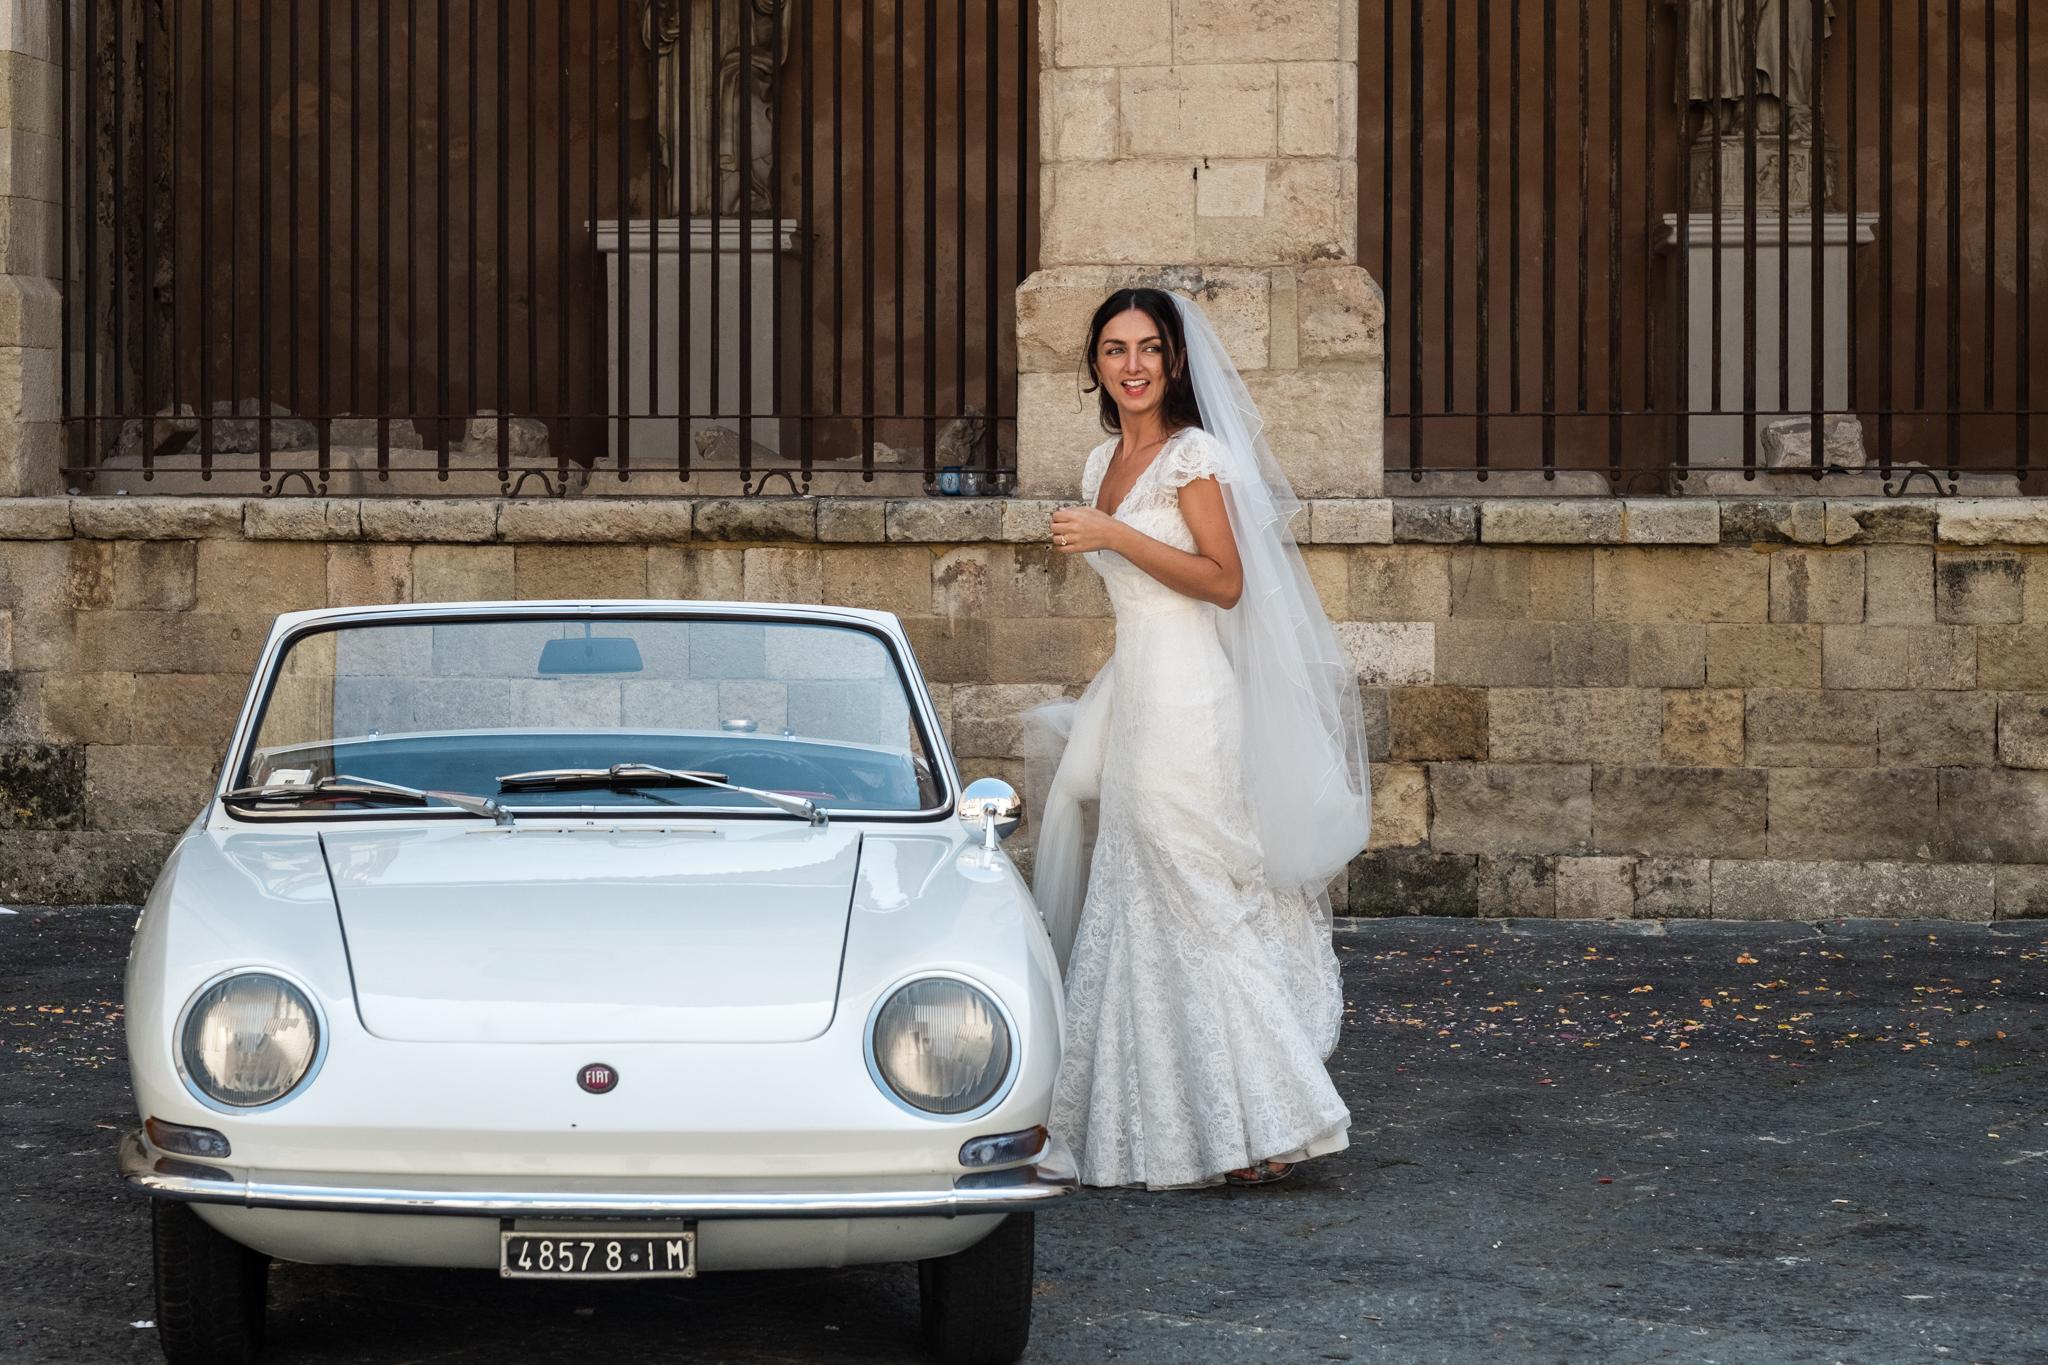 wedding-photography-in-italy-36.jpg